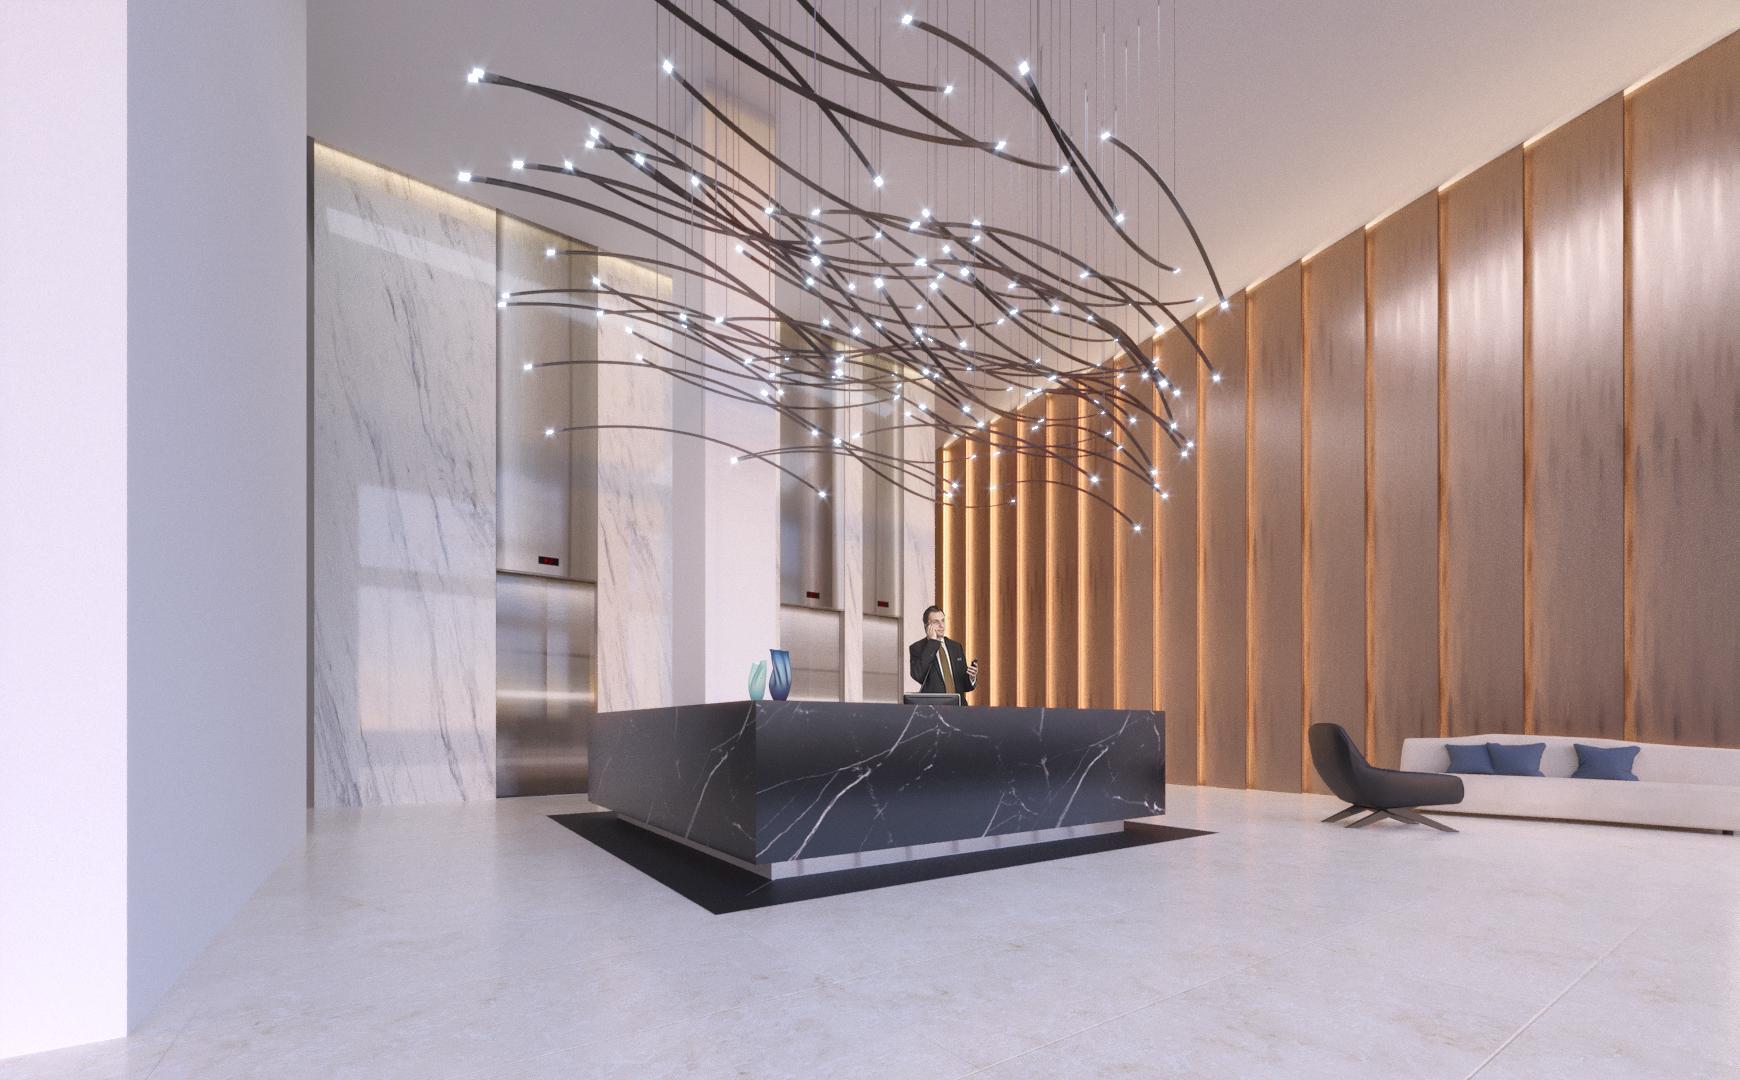 Rendering of Mississauga Square Condos interior lobby